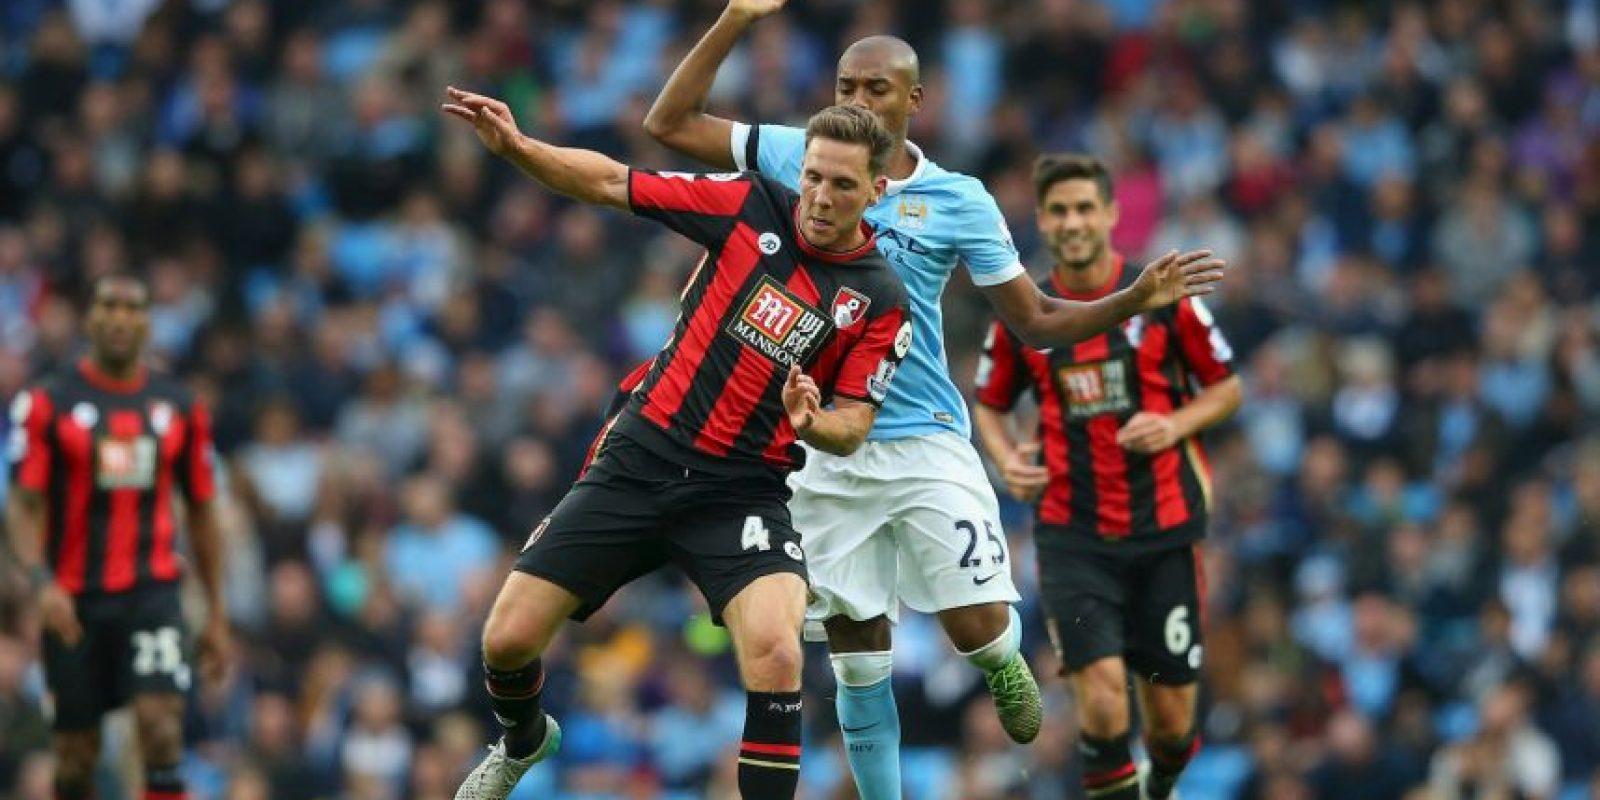 Premier League: Bournemouth vs. Manchester City Foto:Getty Images